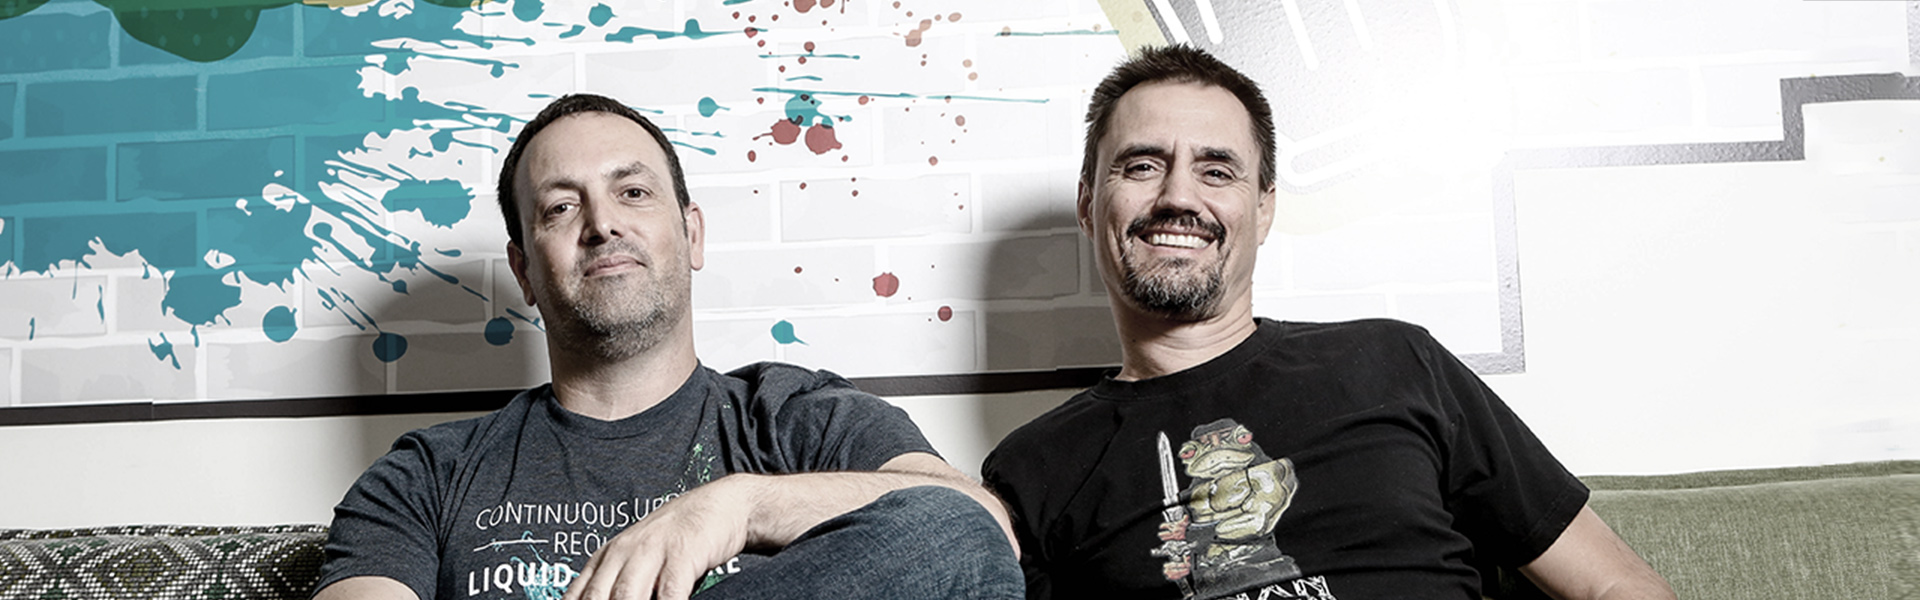 Promising Startups - jfrog / צילום: שלומי יוסף